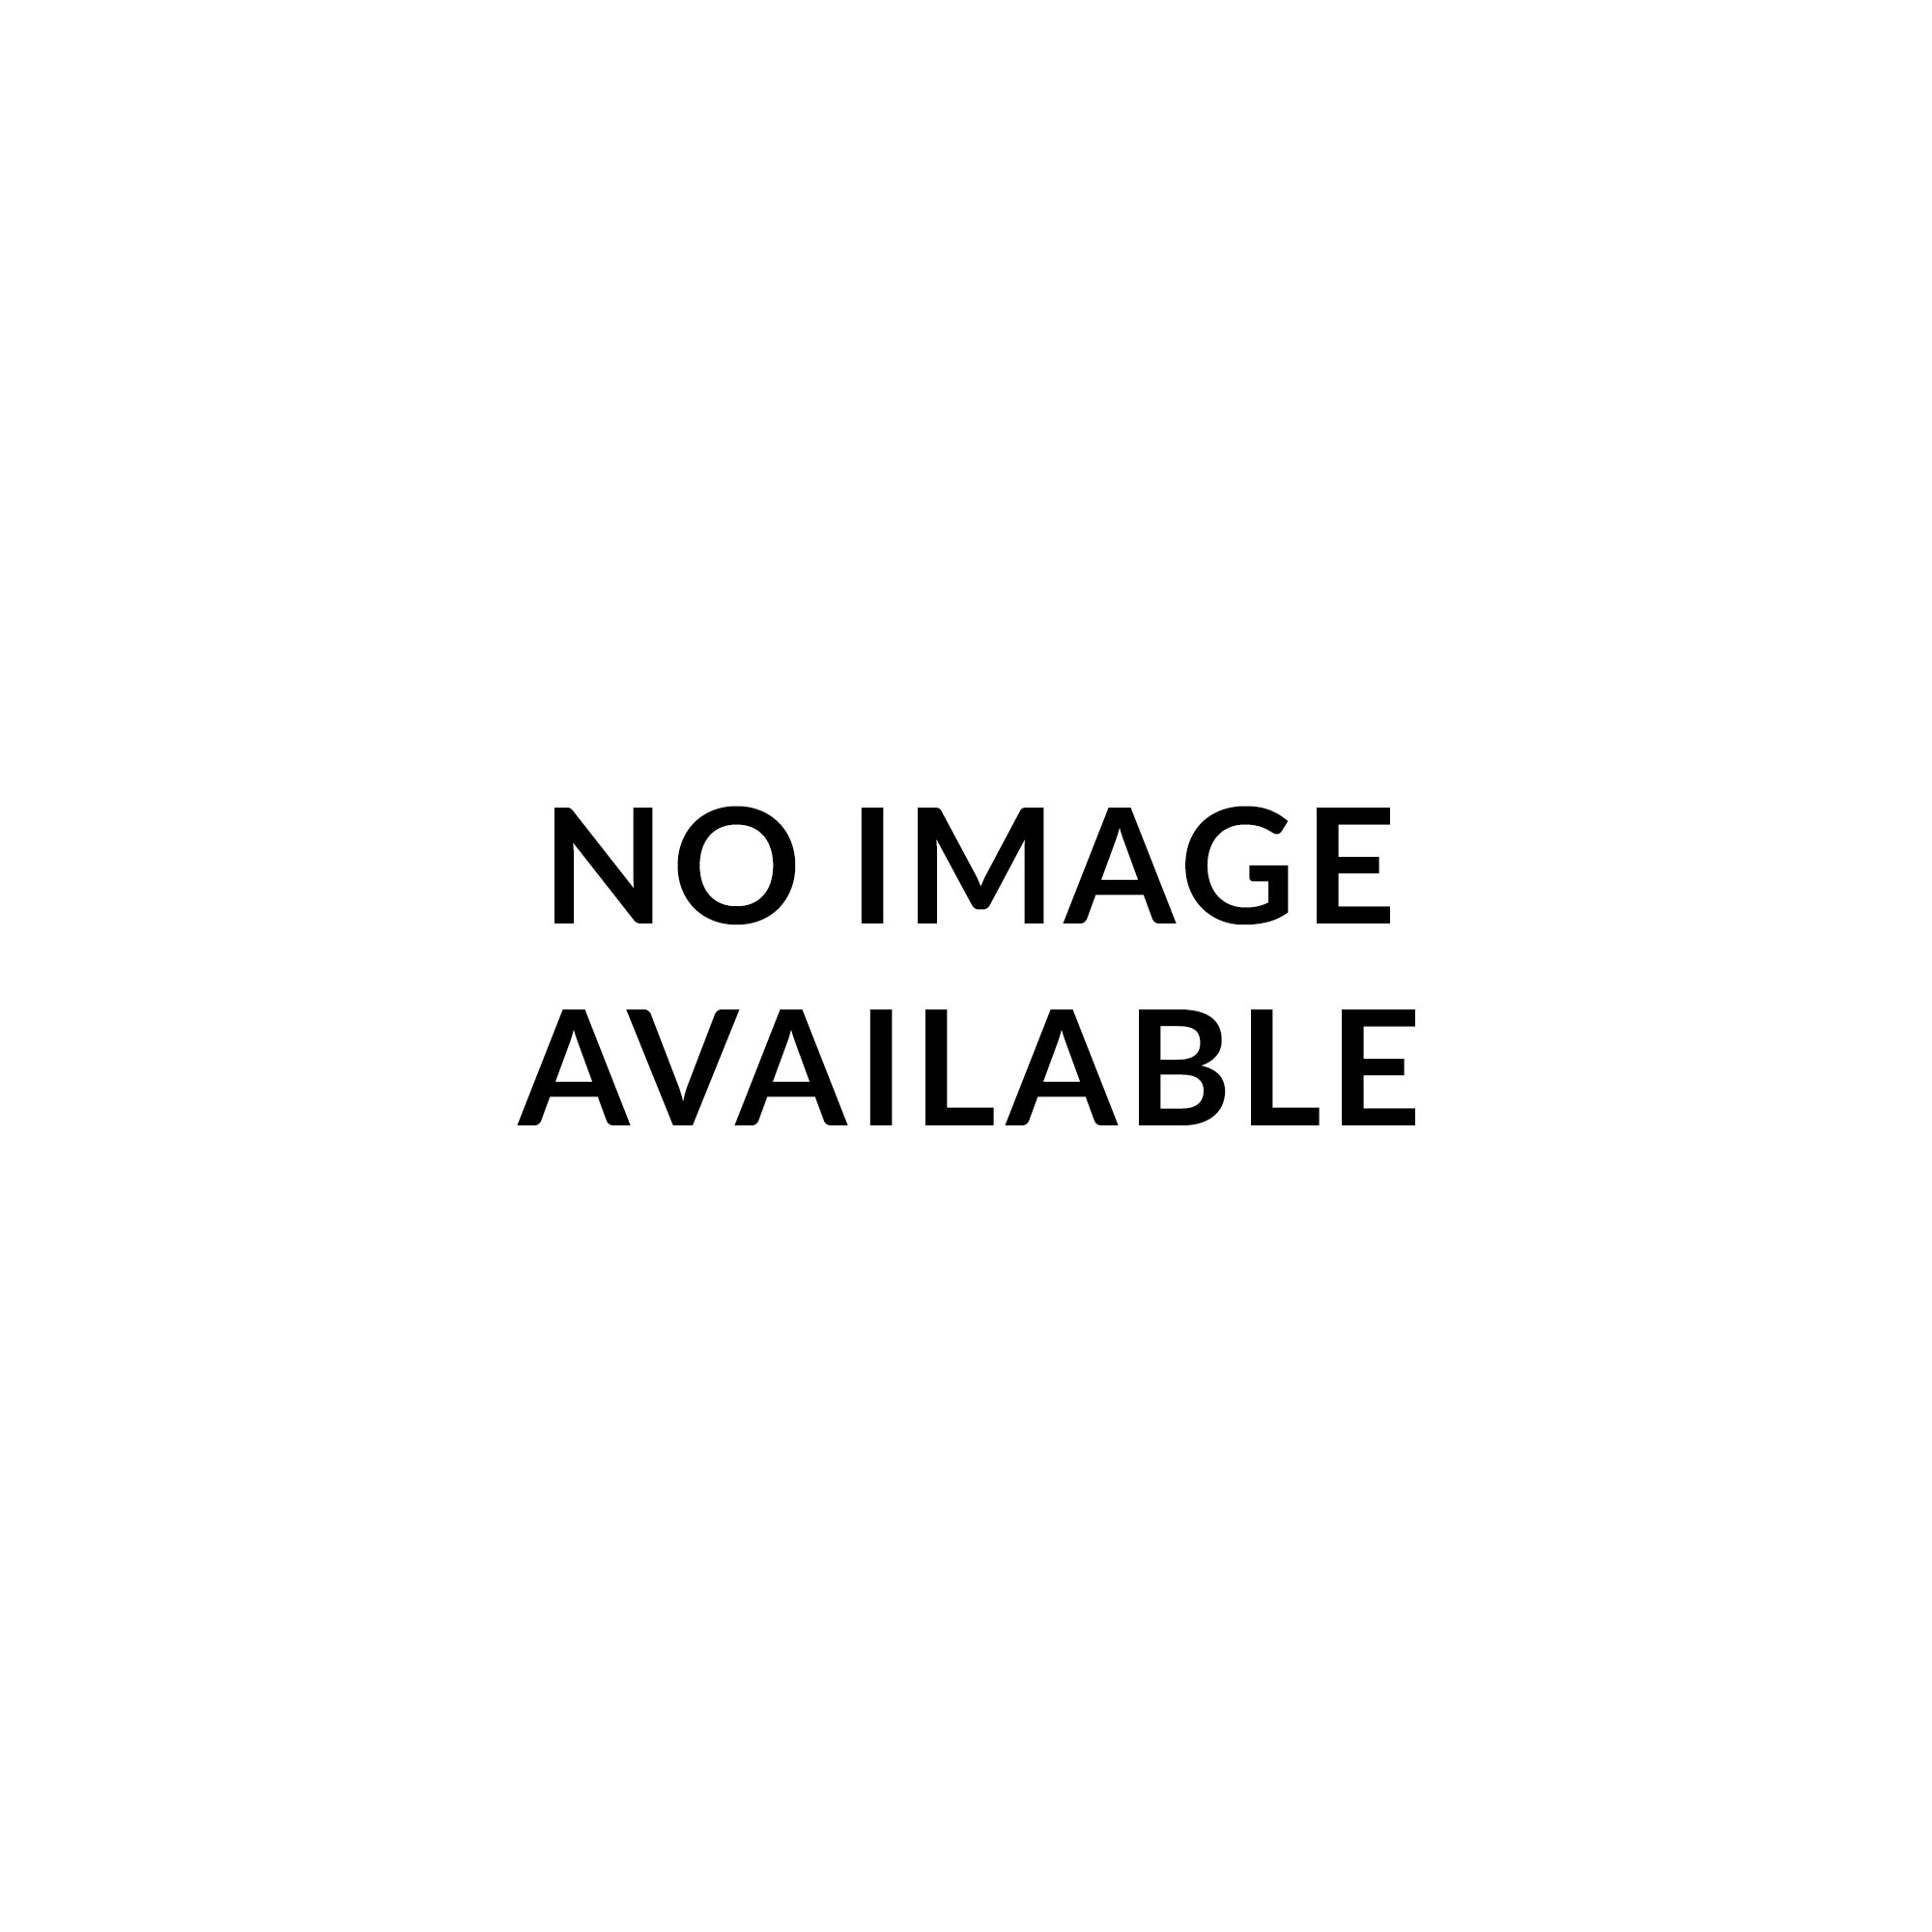 D'Addario PSB032 ProSteels XL Bass Single String .032 Long Scale